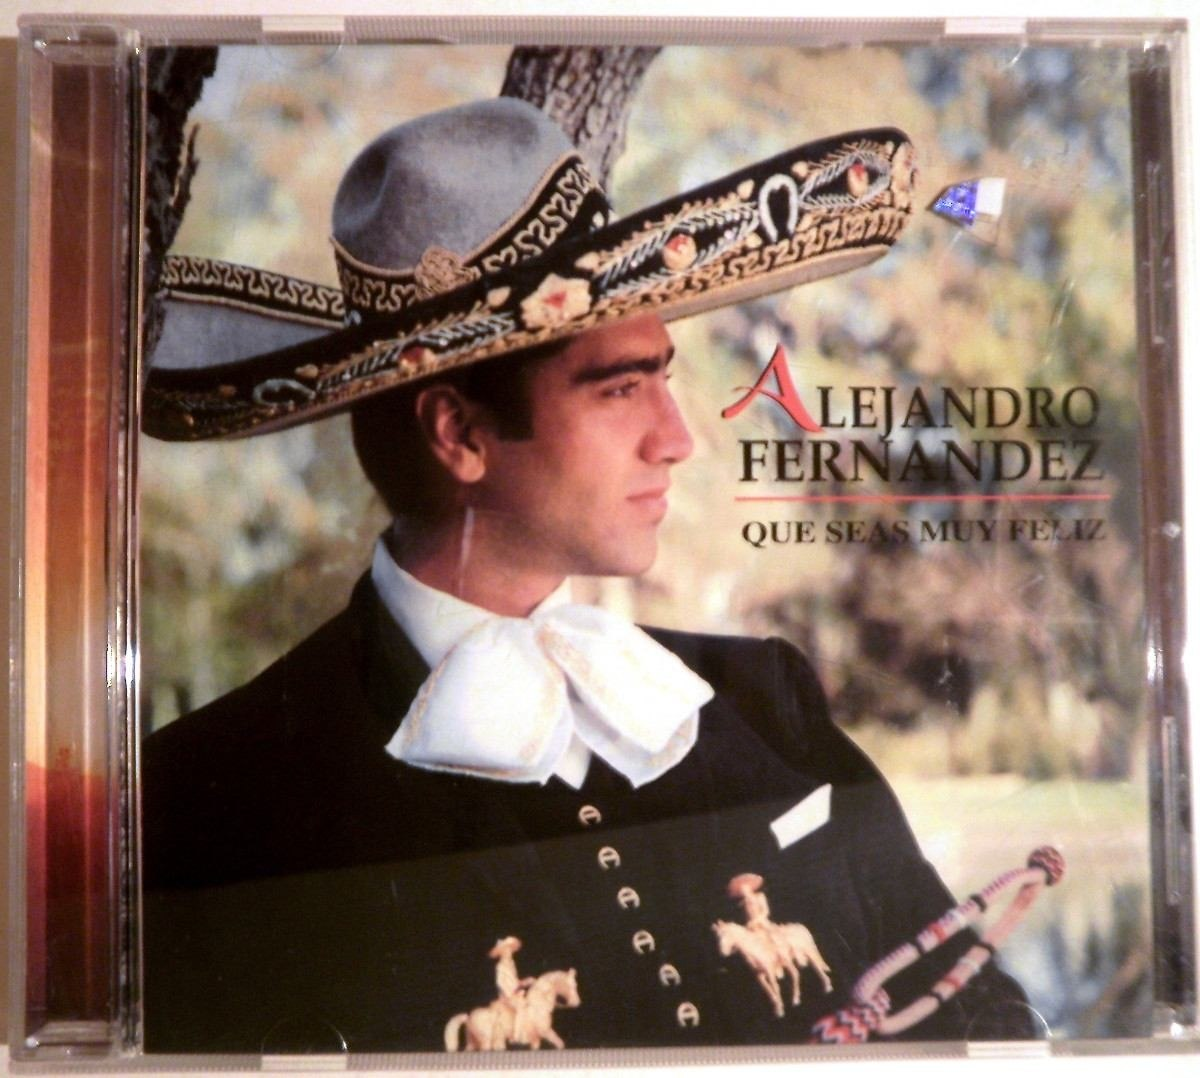 Alejandro fern ndez discos cd discograf a original bs 4 for Alejandro fernandez en el jardin mp3